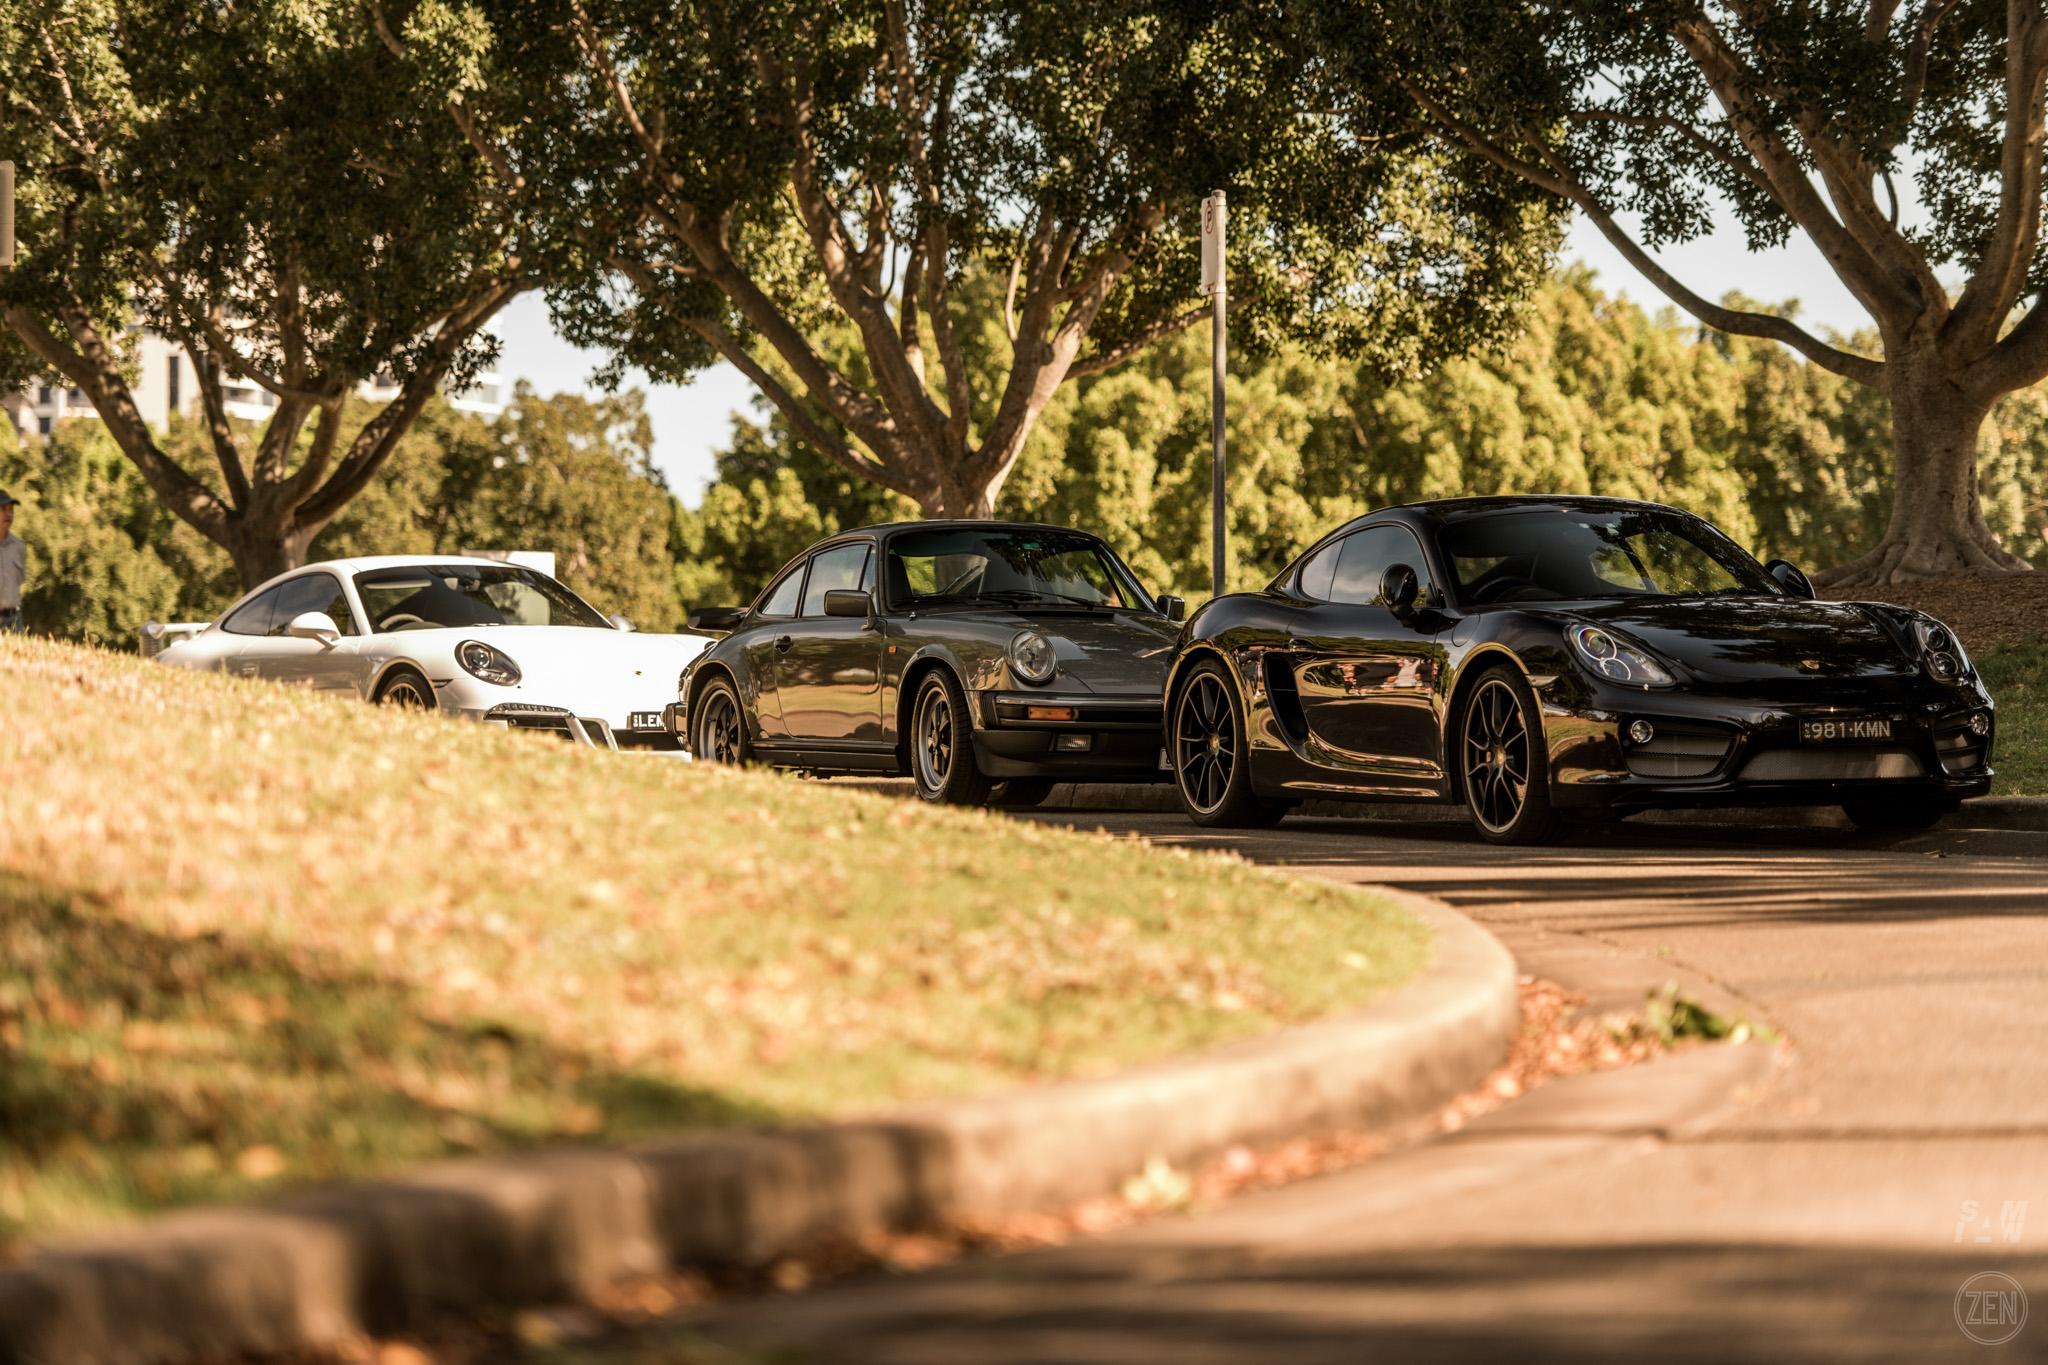 2019-10-27 - Autohaus Porsches & Coffee 177